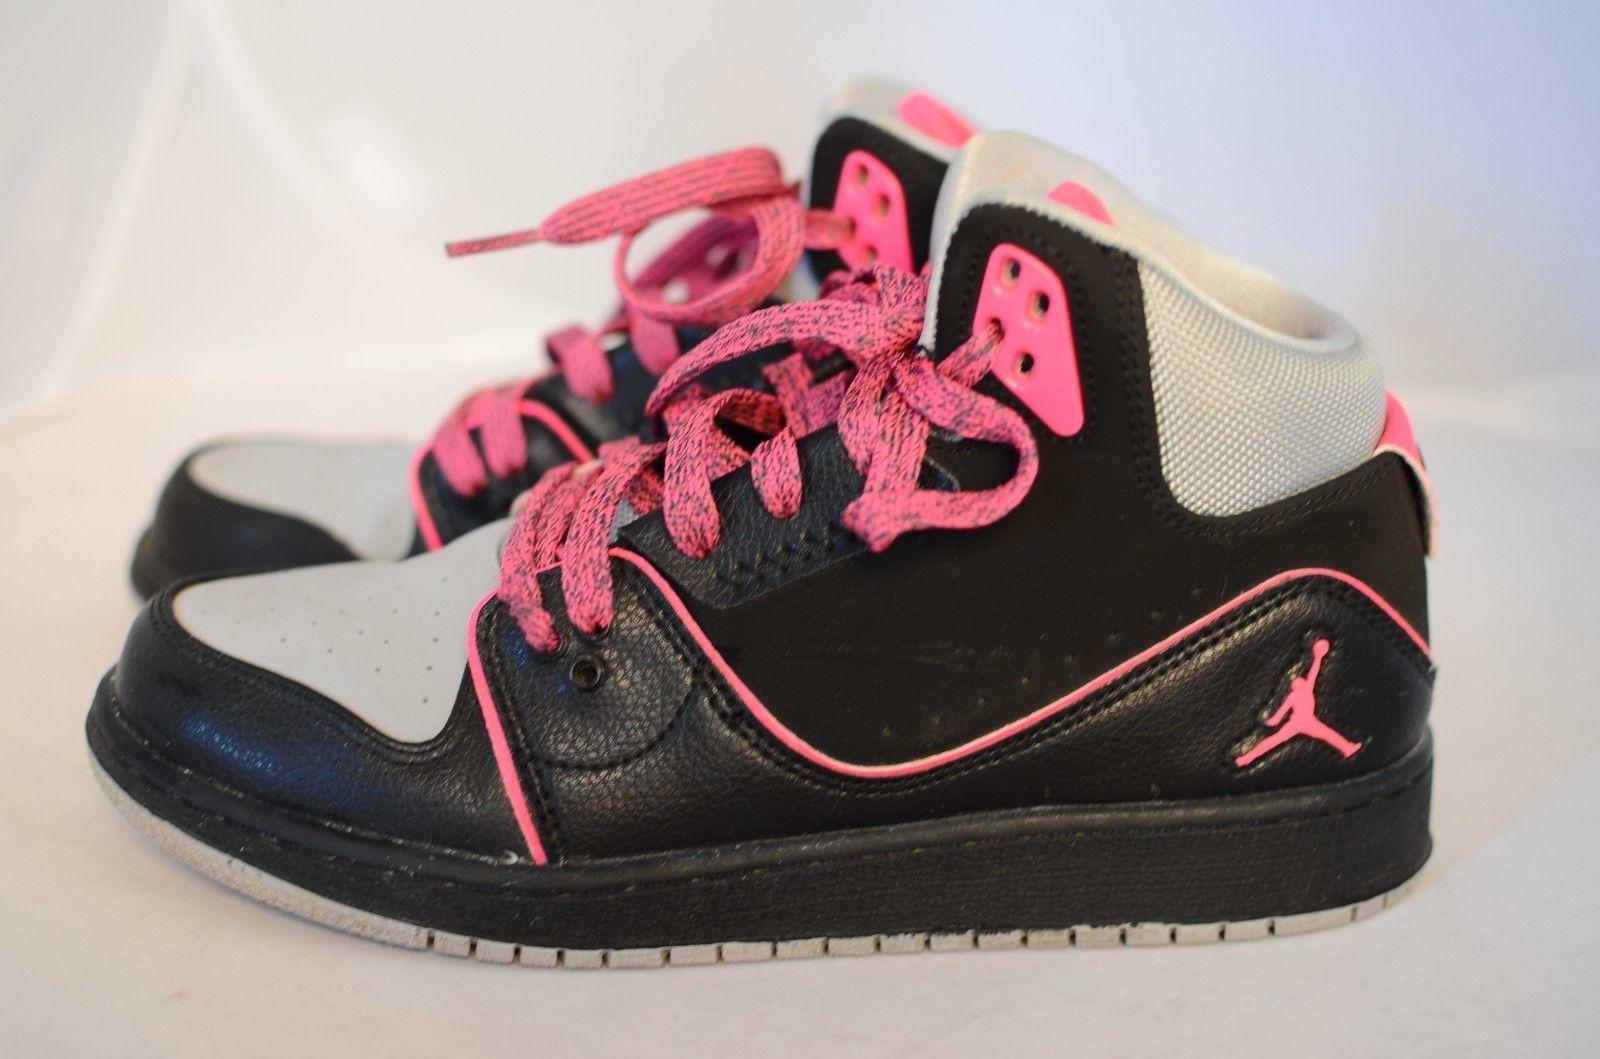 Find Nike Jordan Super.Fly 3 Cheap sale Fusion Pink Volt Deep Ga